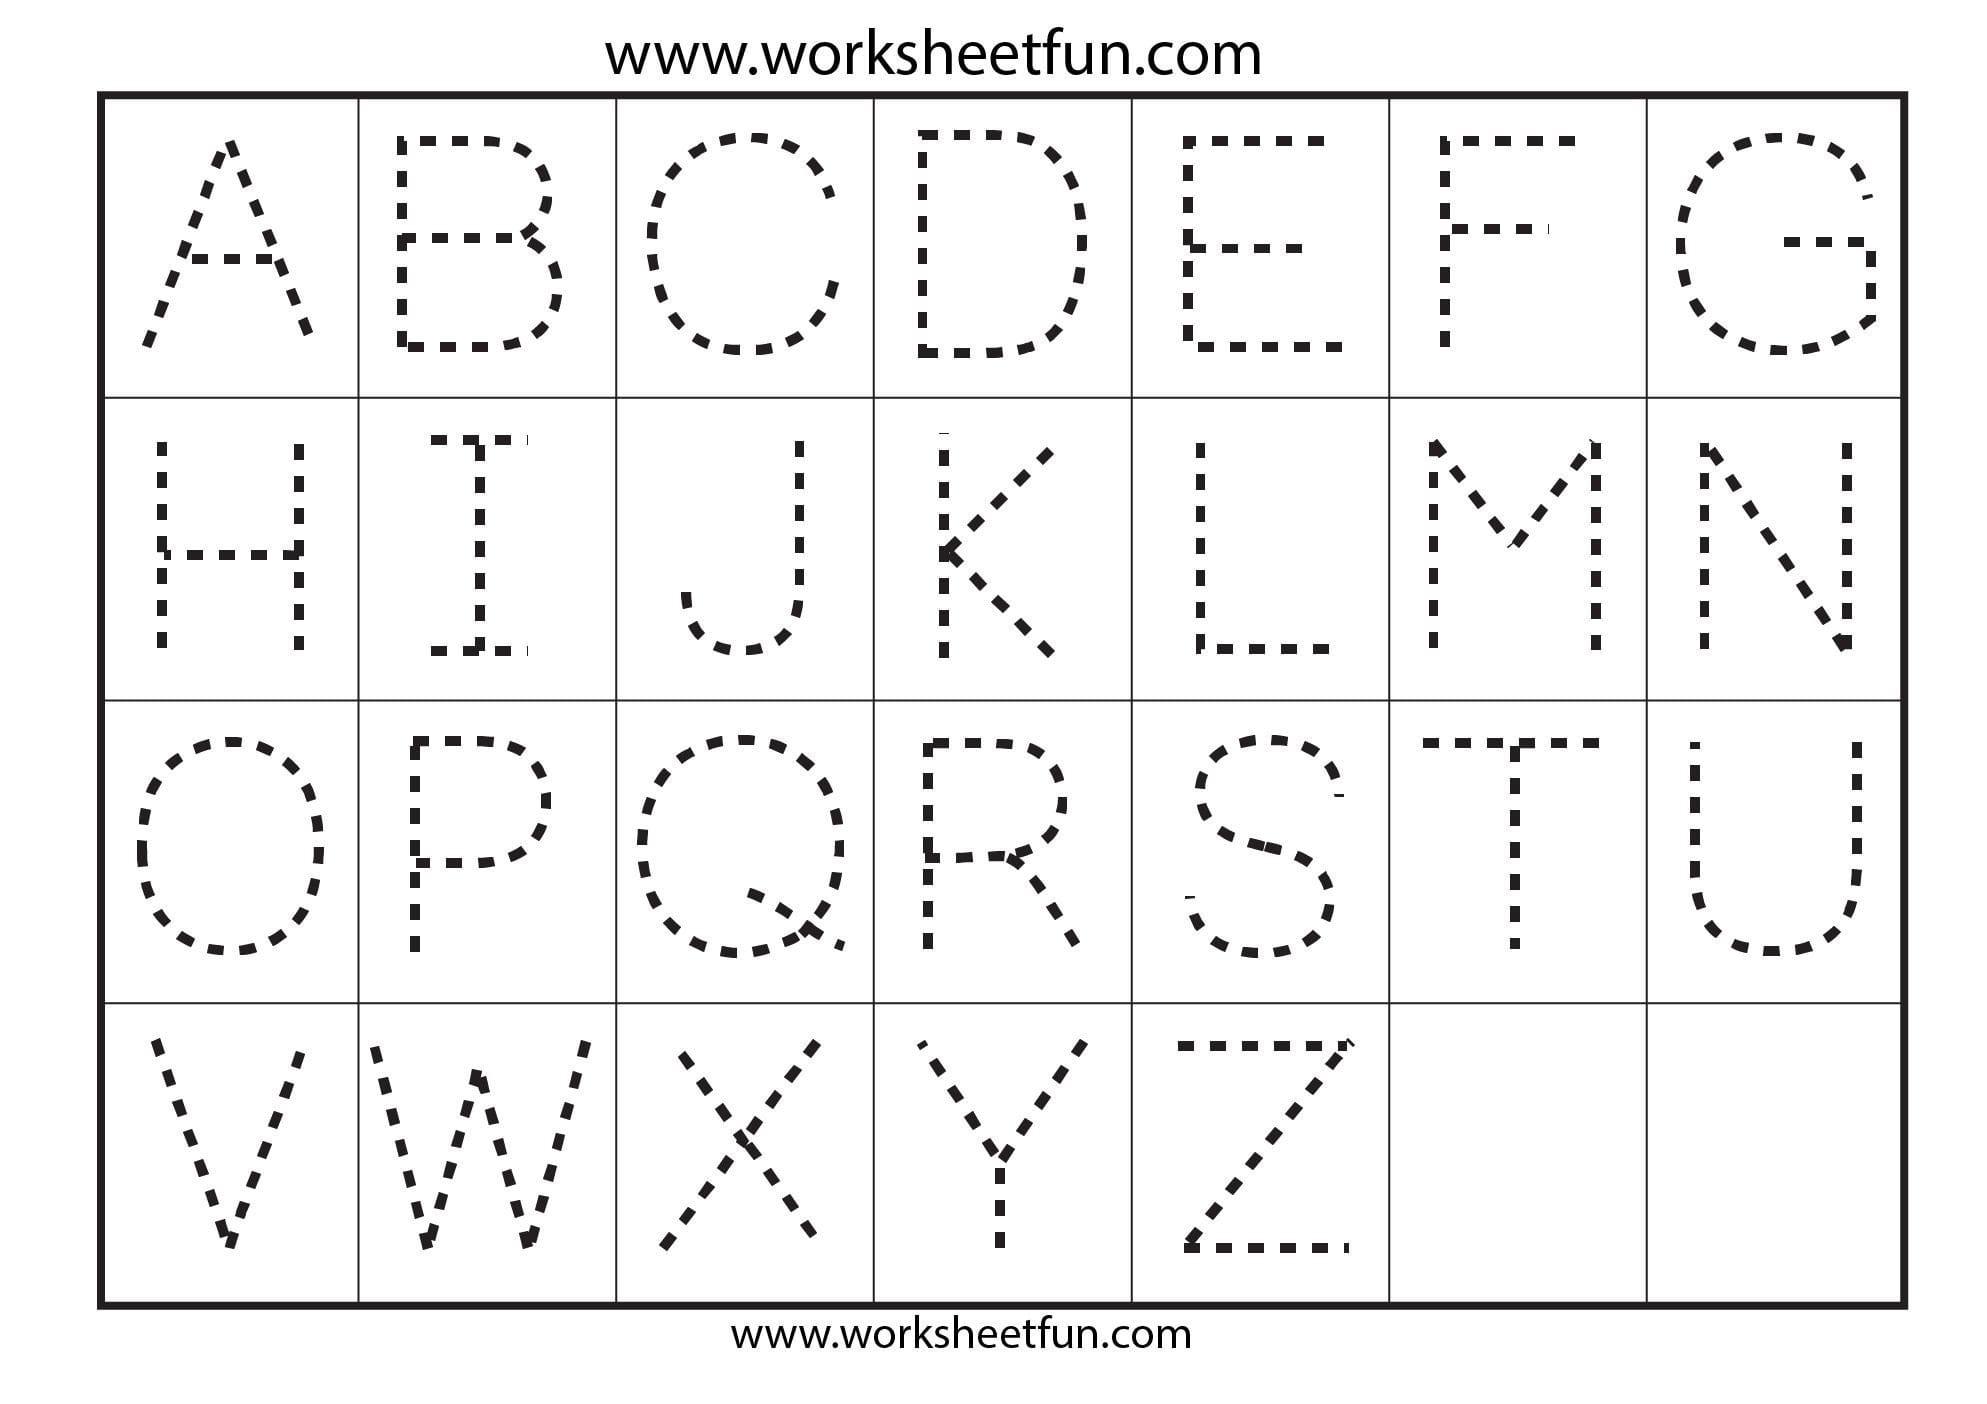 Worksheet Worksheet Library Science Worksheets For Grade Throughout Preschool Worksheets Age 3